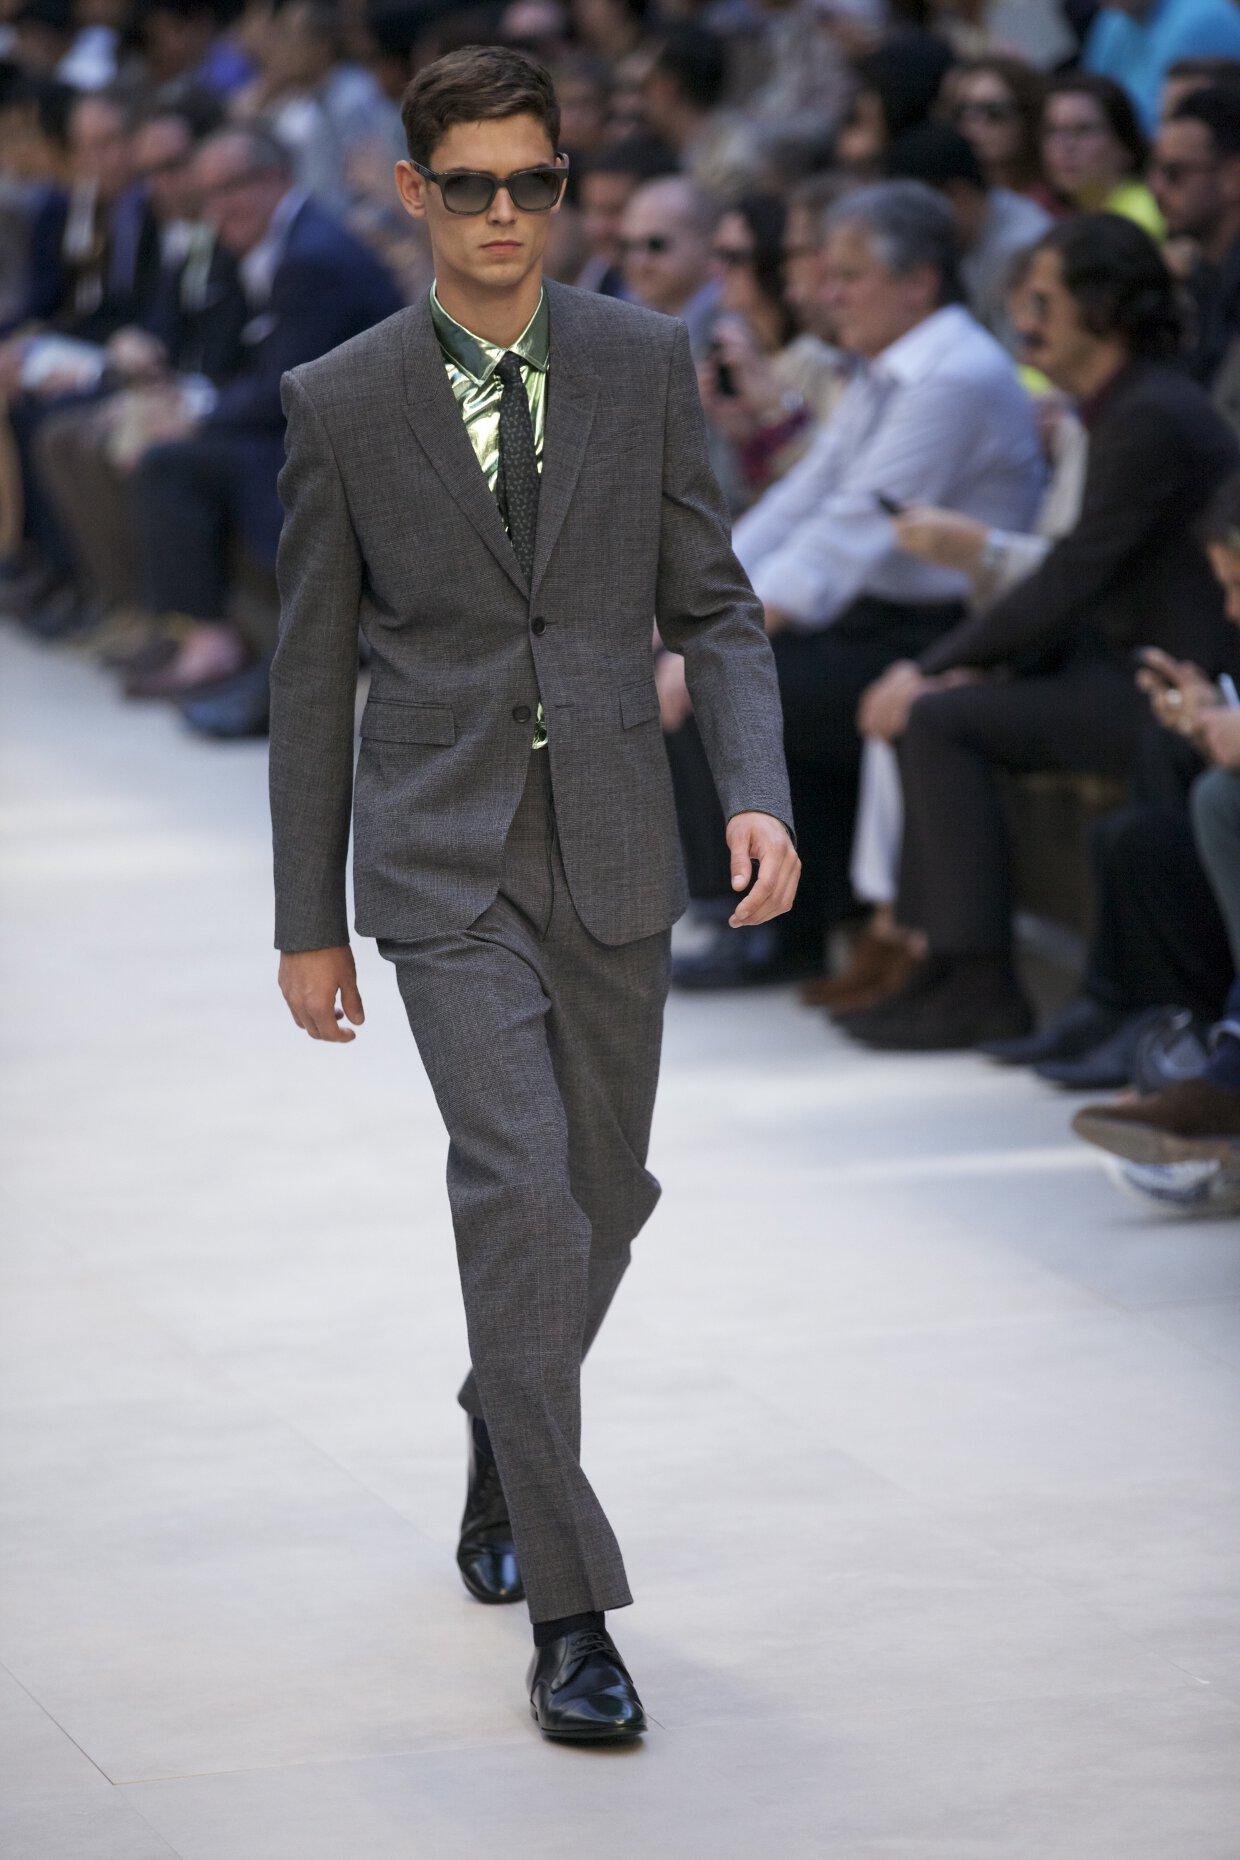 Summer 2013 Fashion Color Trends Burberry Prorsum Tailored Seersucker Suit